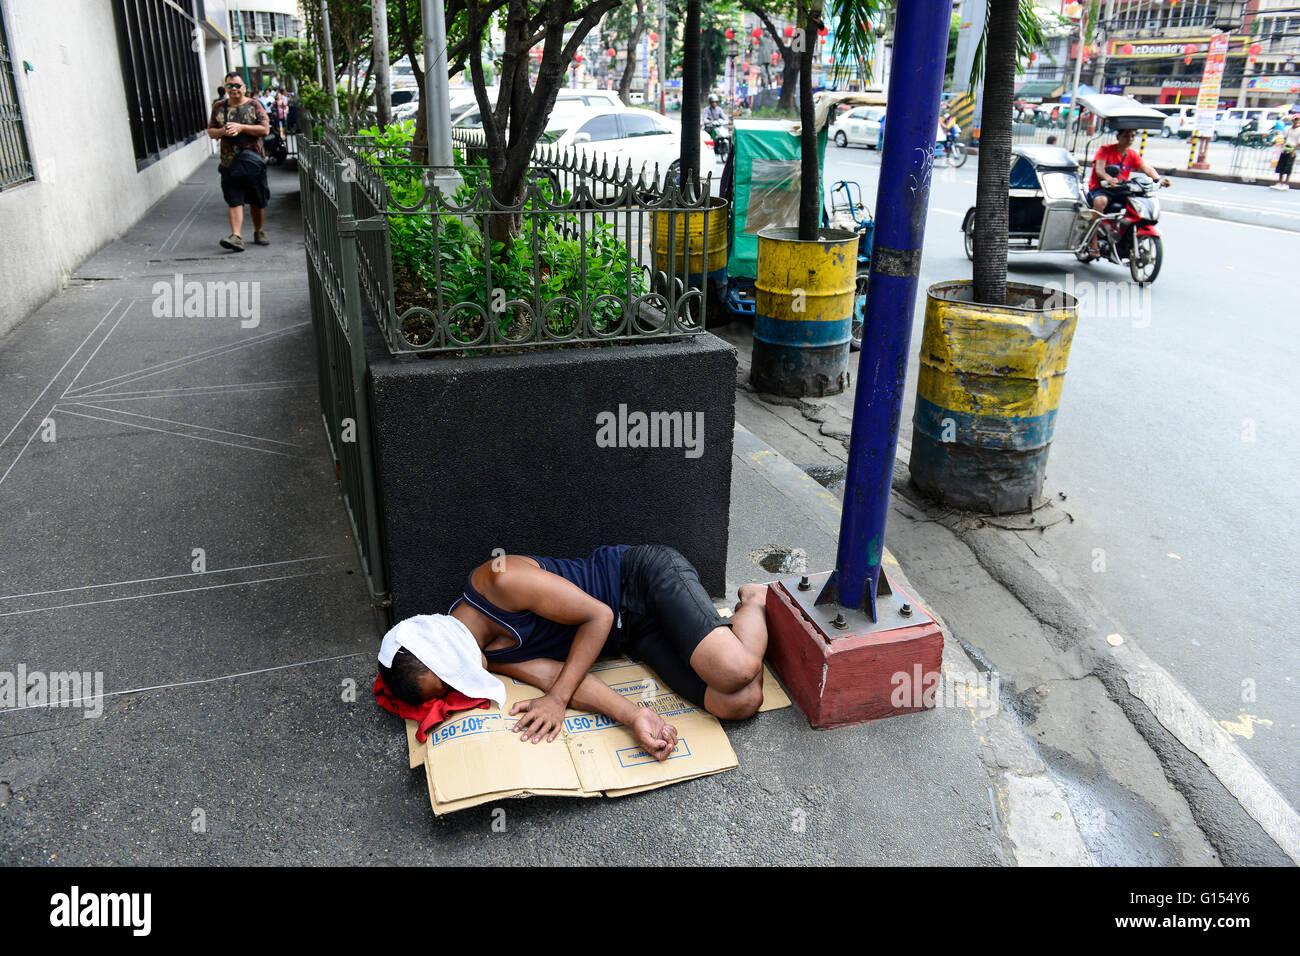 PHILIPPINES, Manila, China Town, sleeping homeless people / PHILIPPINEN, Manila, Chinatown, schlafende Obdachlose - Stock Image